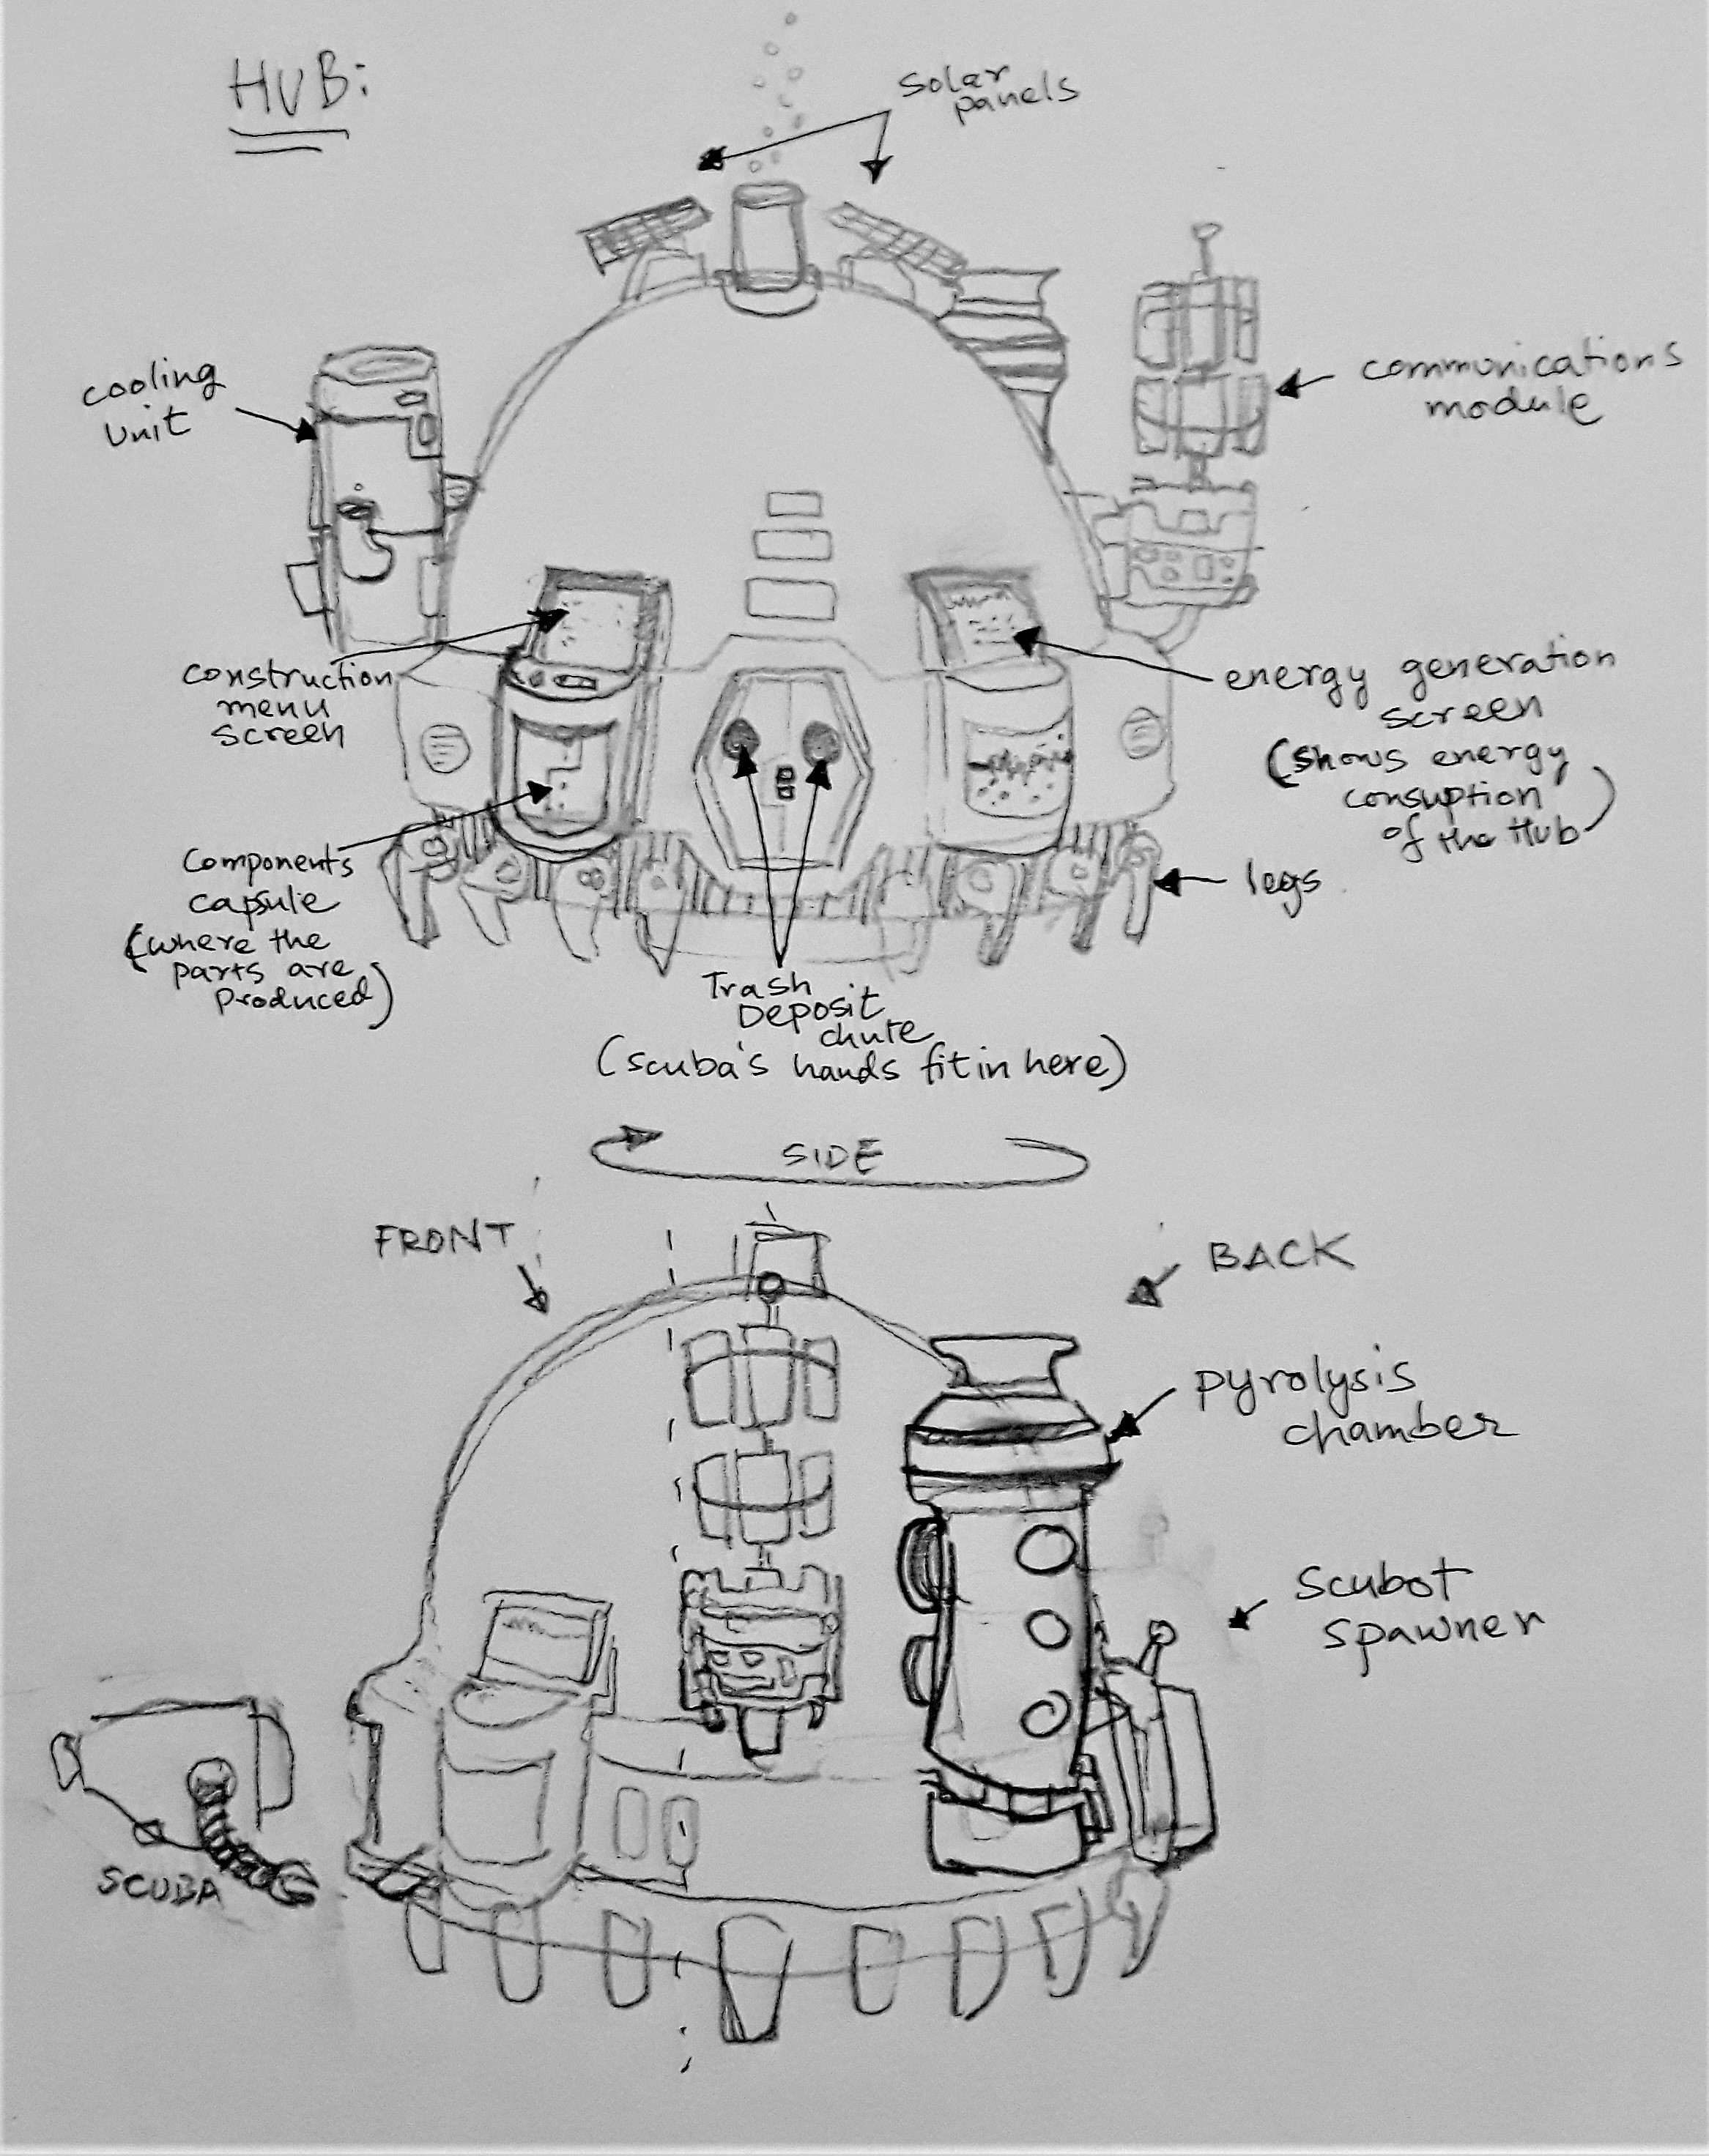 Sketch of Hub on paper